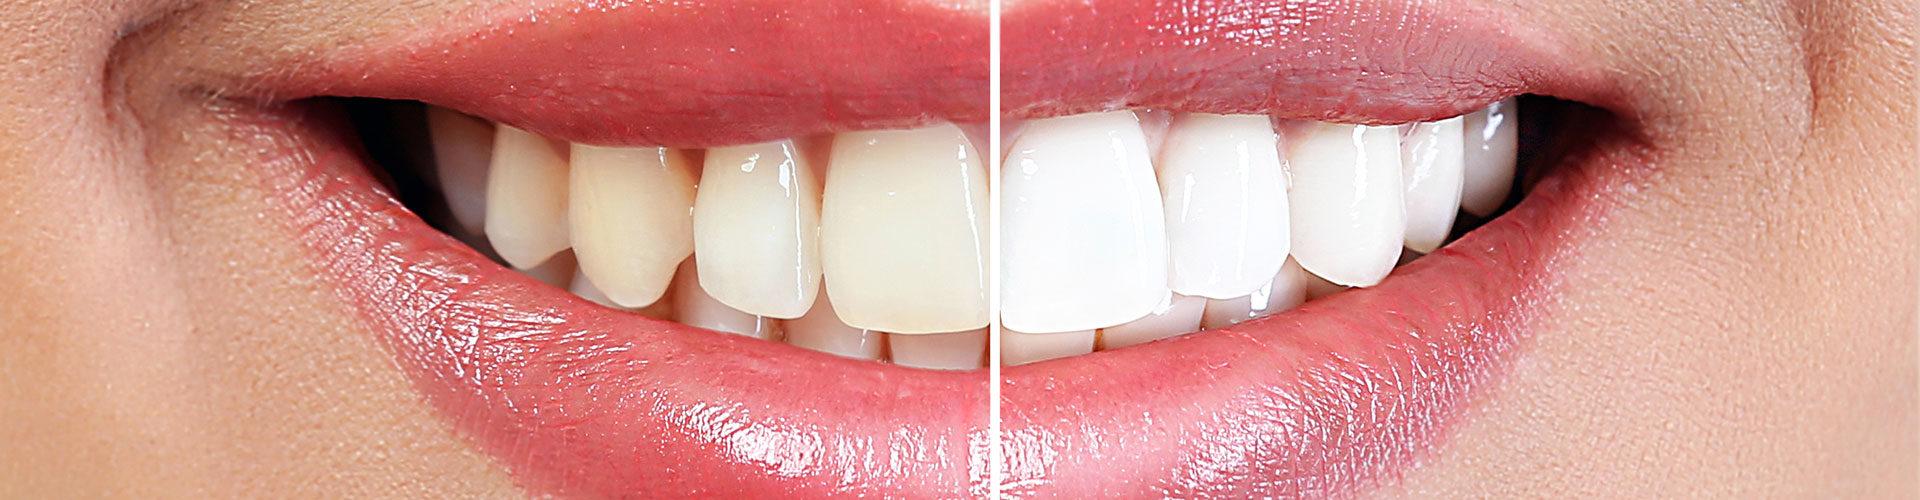 Teeth Whitening In Calgary